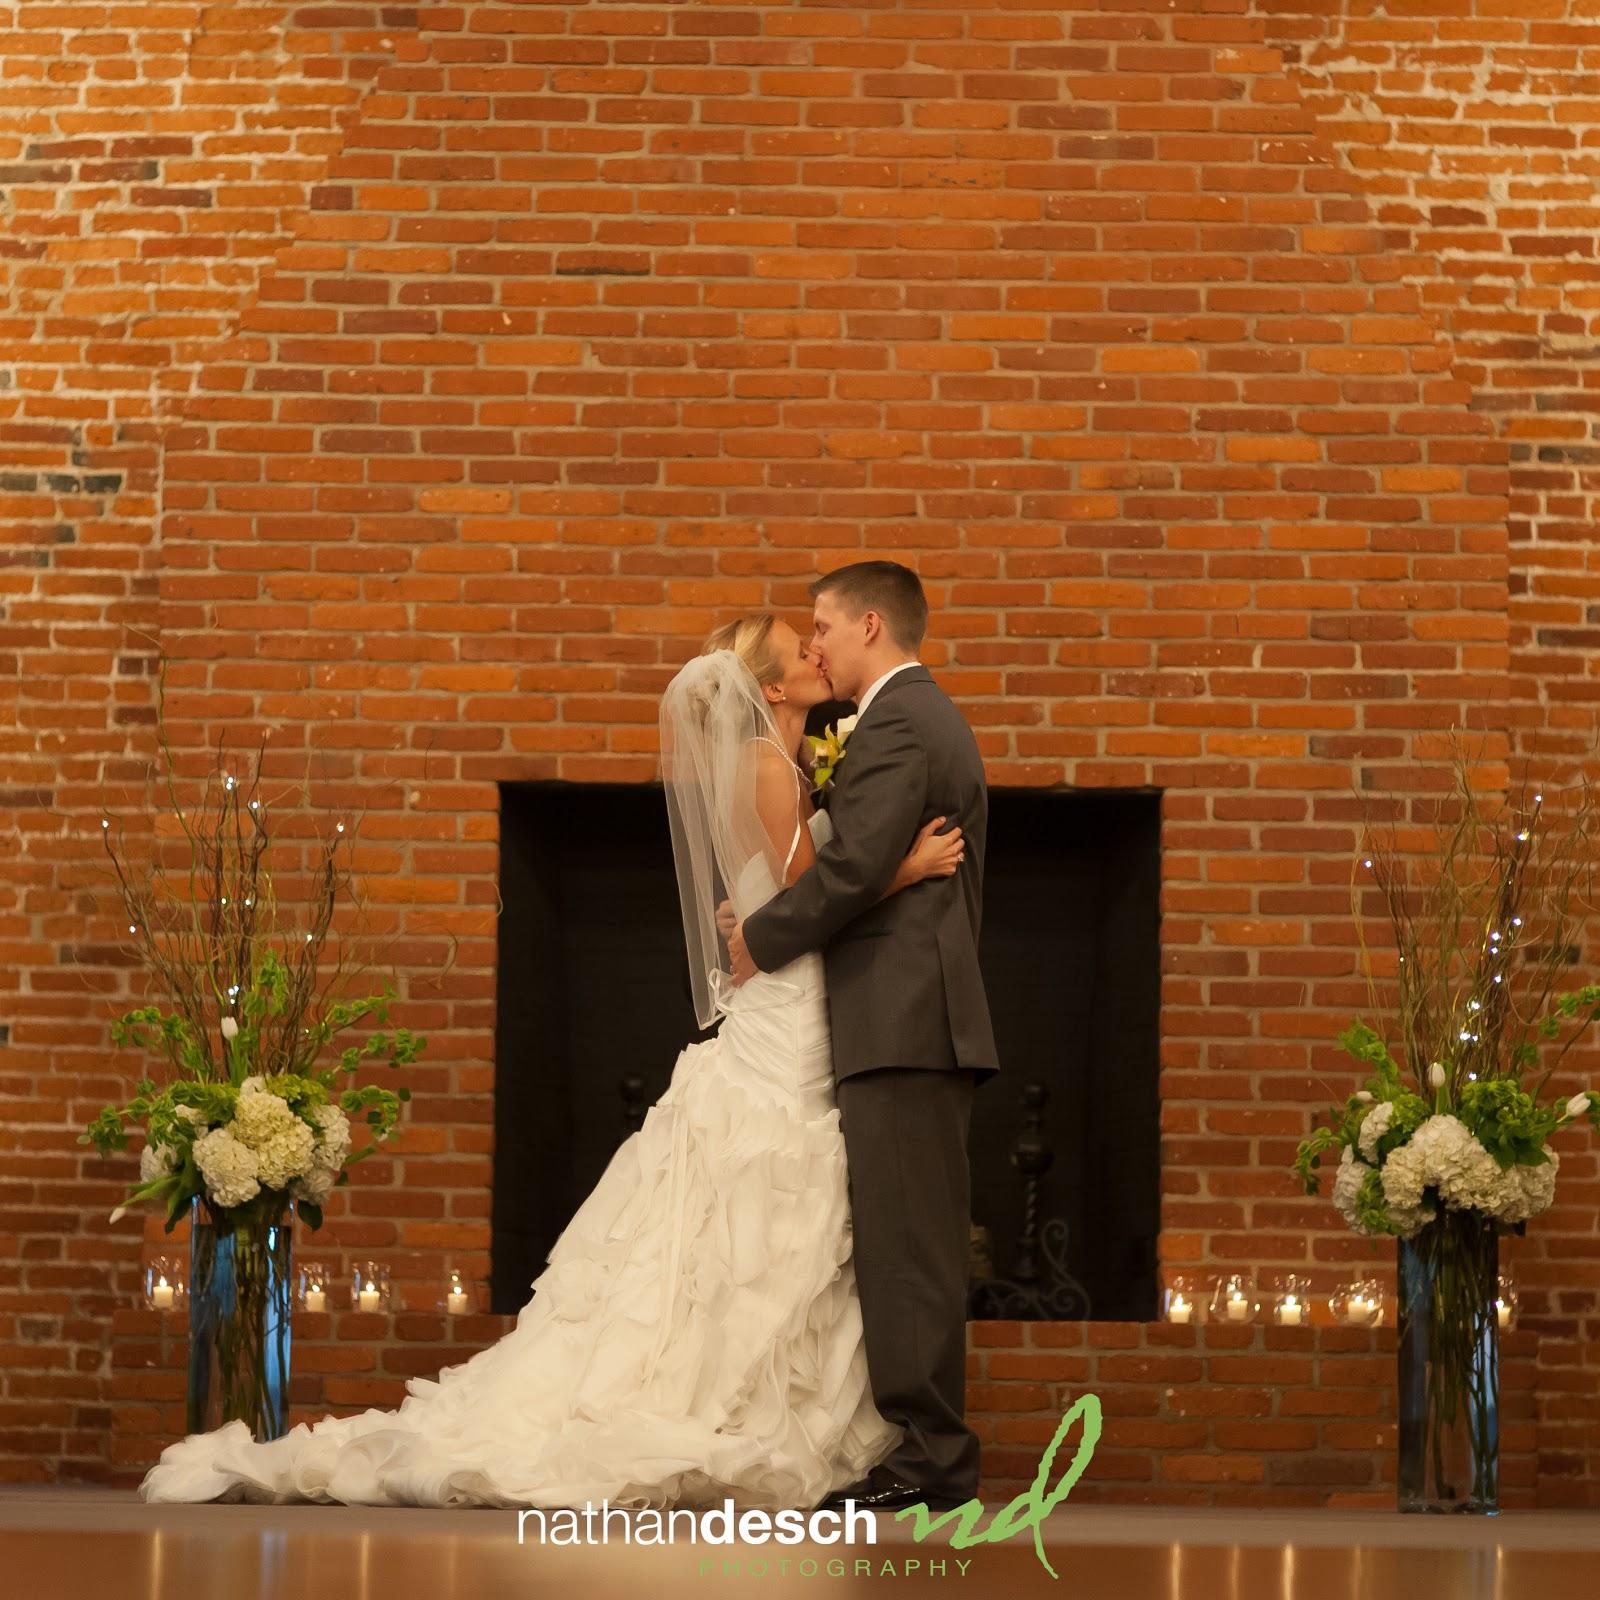 Cork Factory Hotel: Lancaster Wedding Photographer